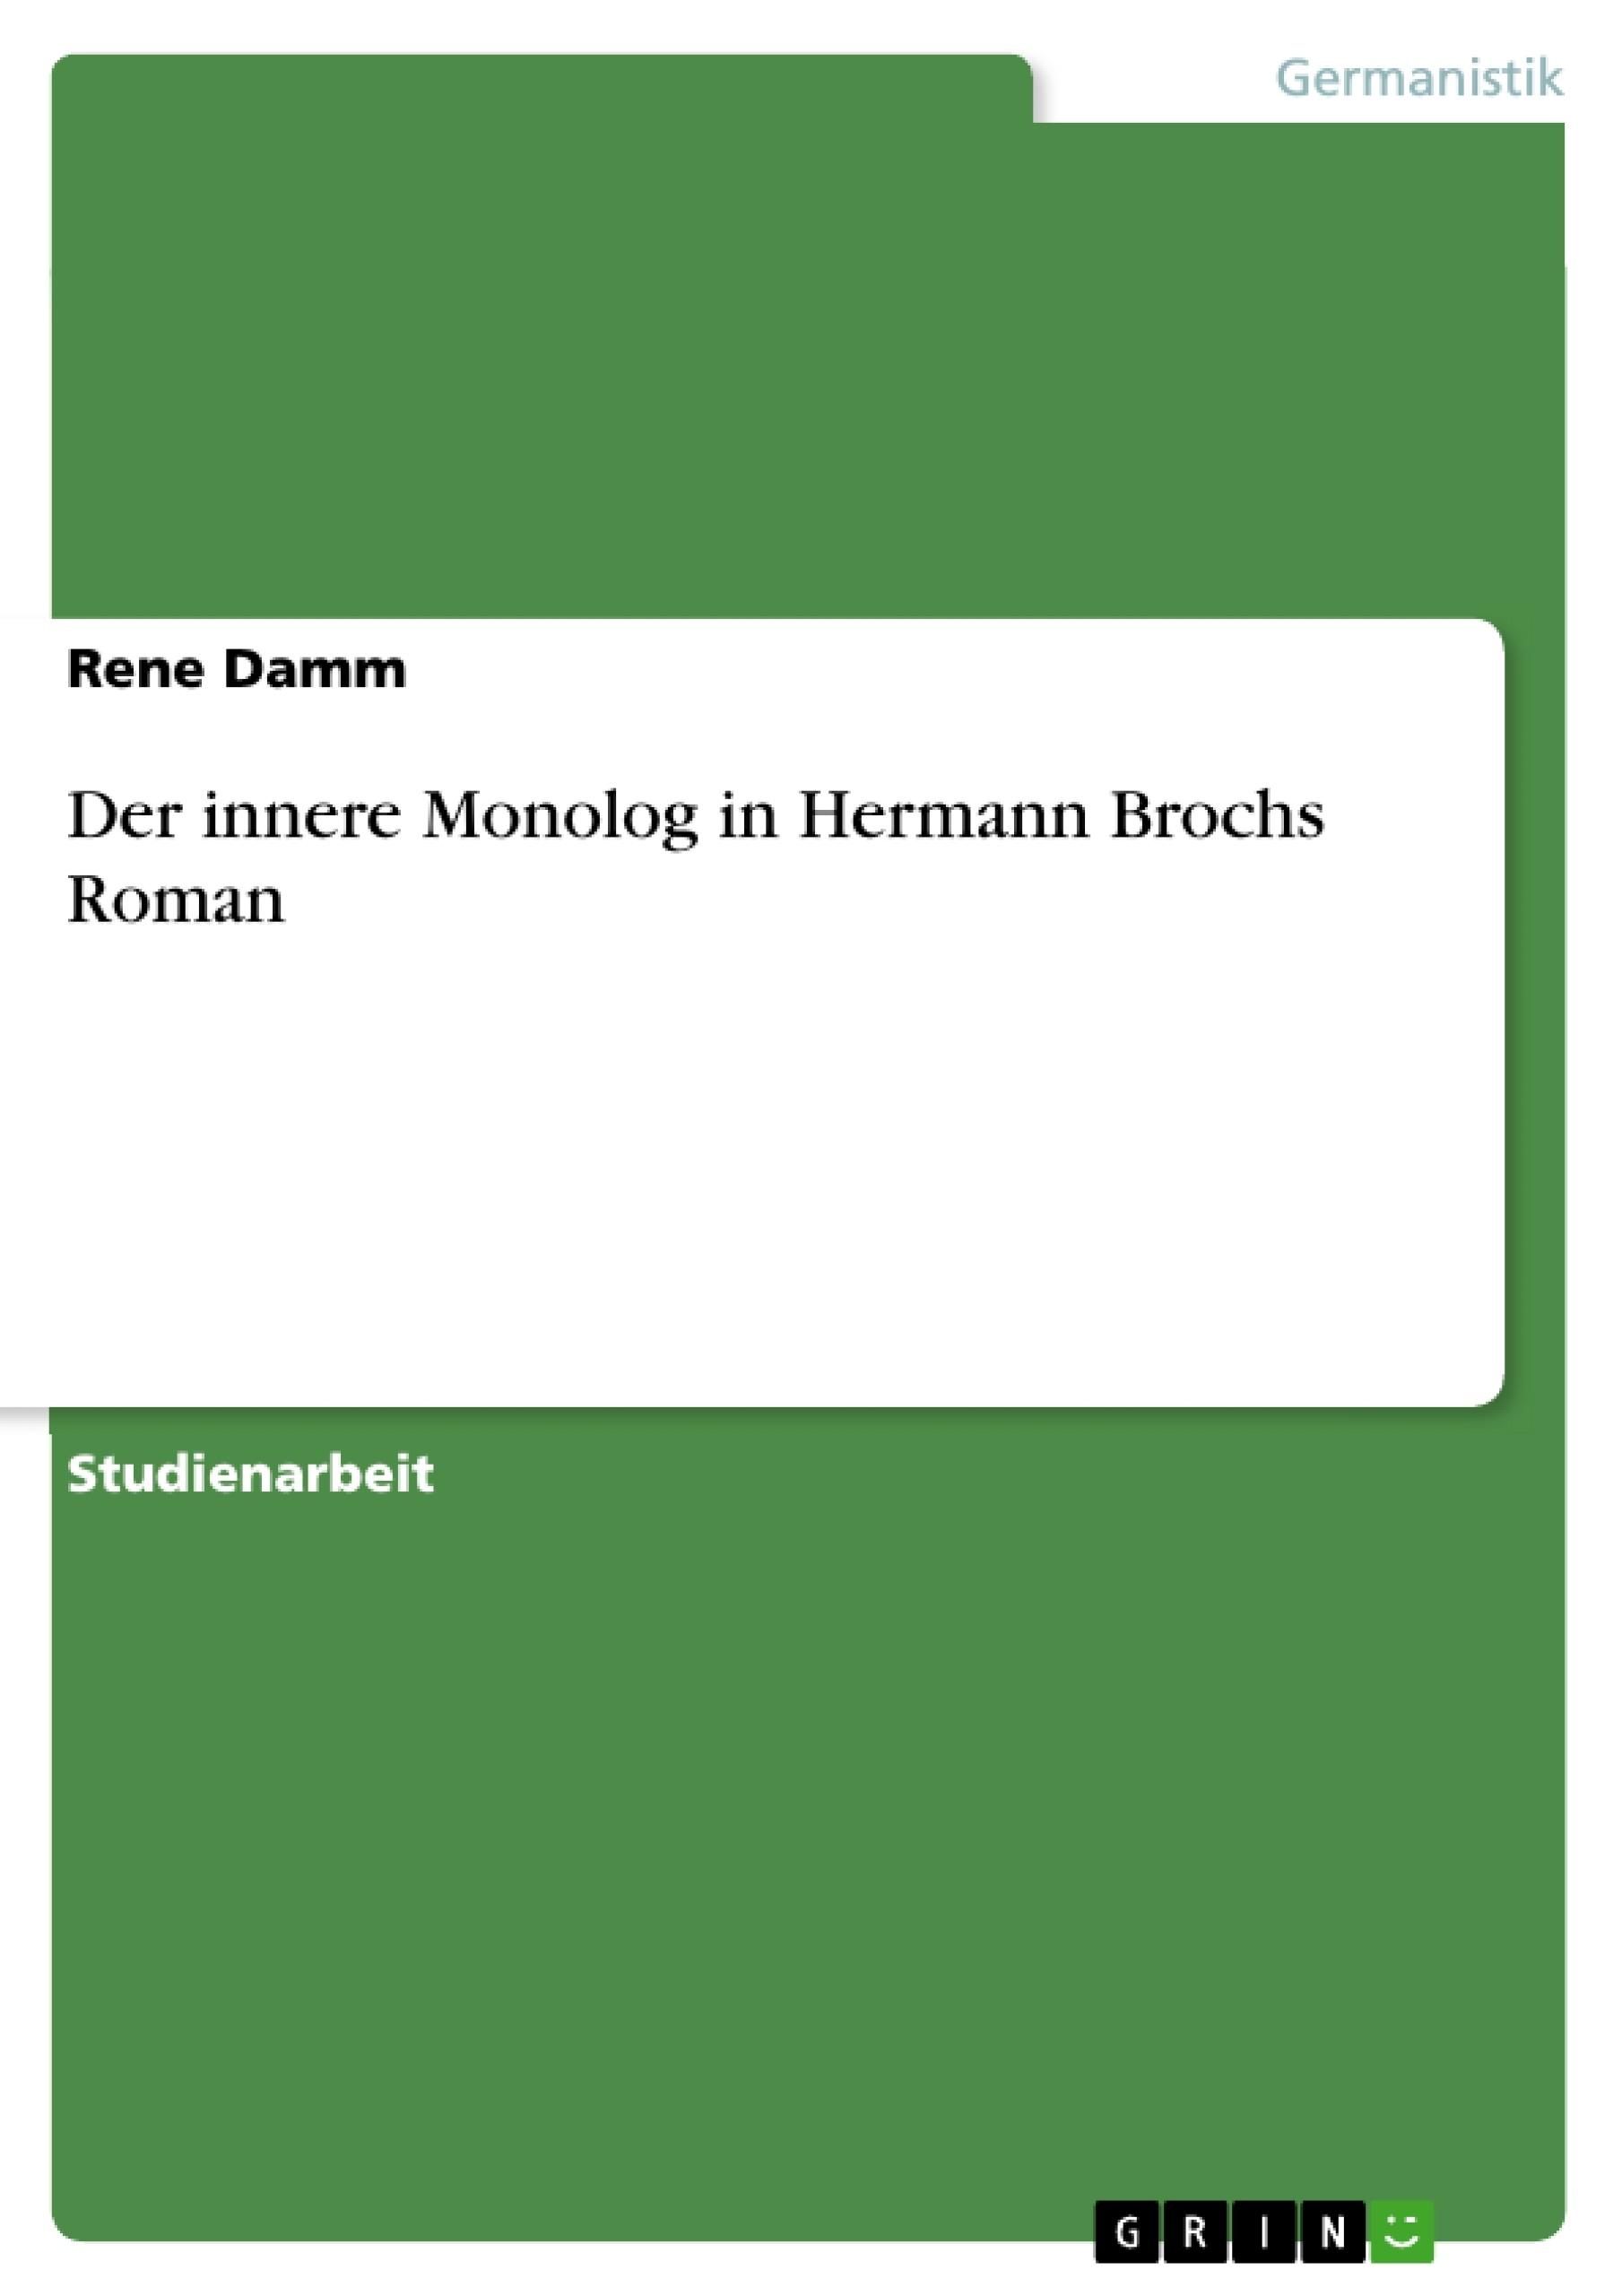 Titel: Der innere Monolog in Hermann Brochs Roman